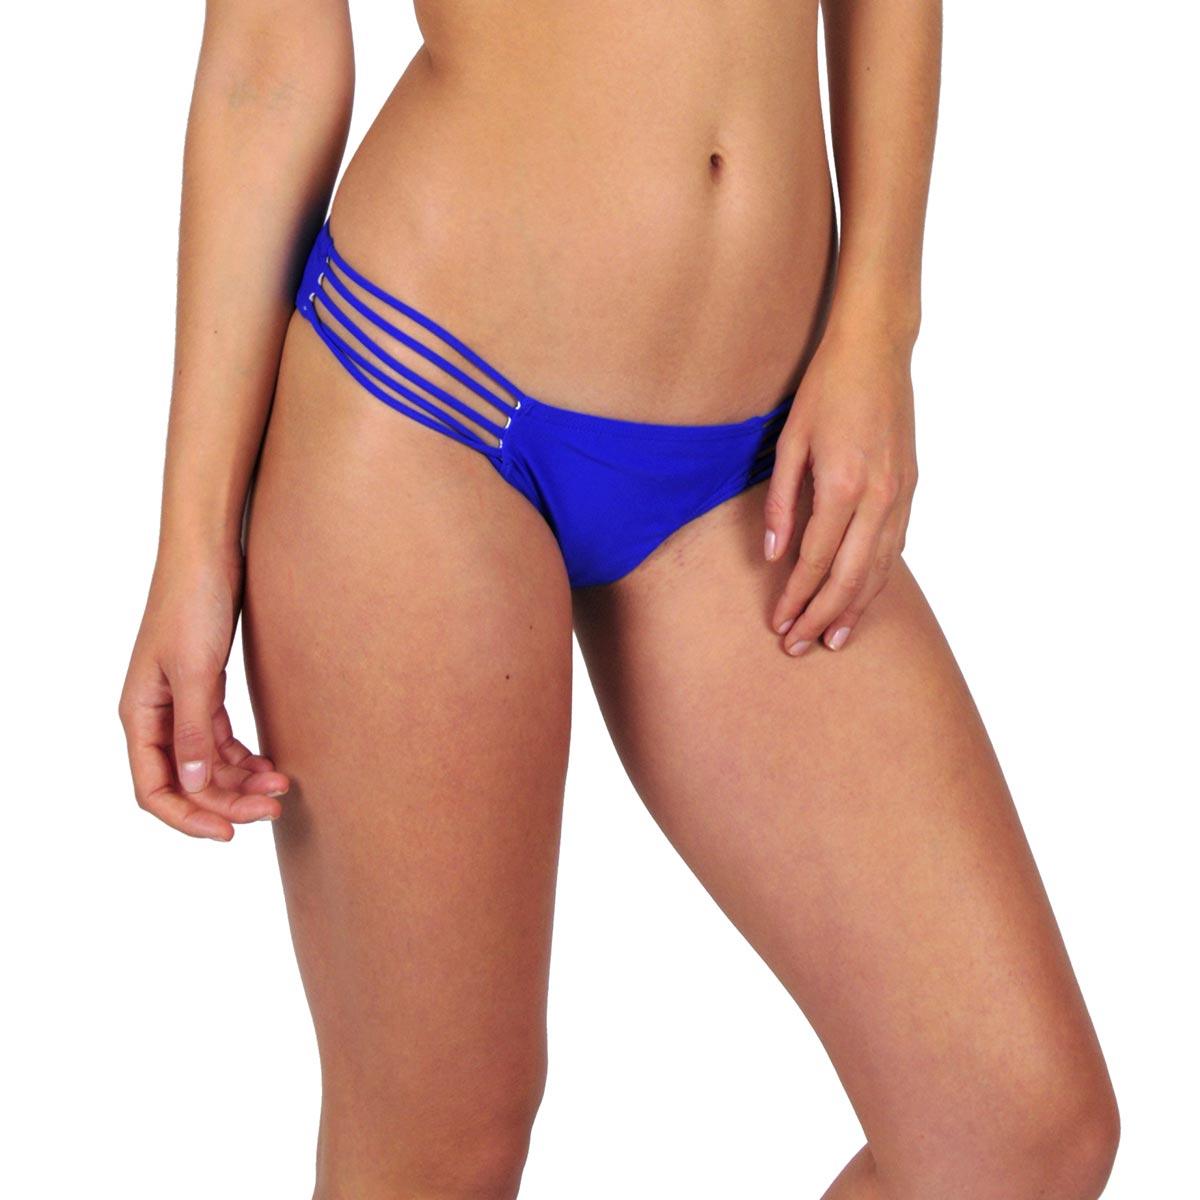 Ma culotte Itsy Bikini Bleu Roi (Bas)